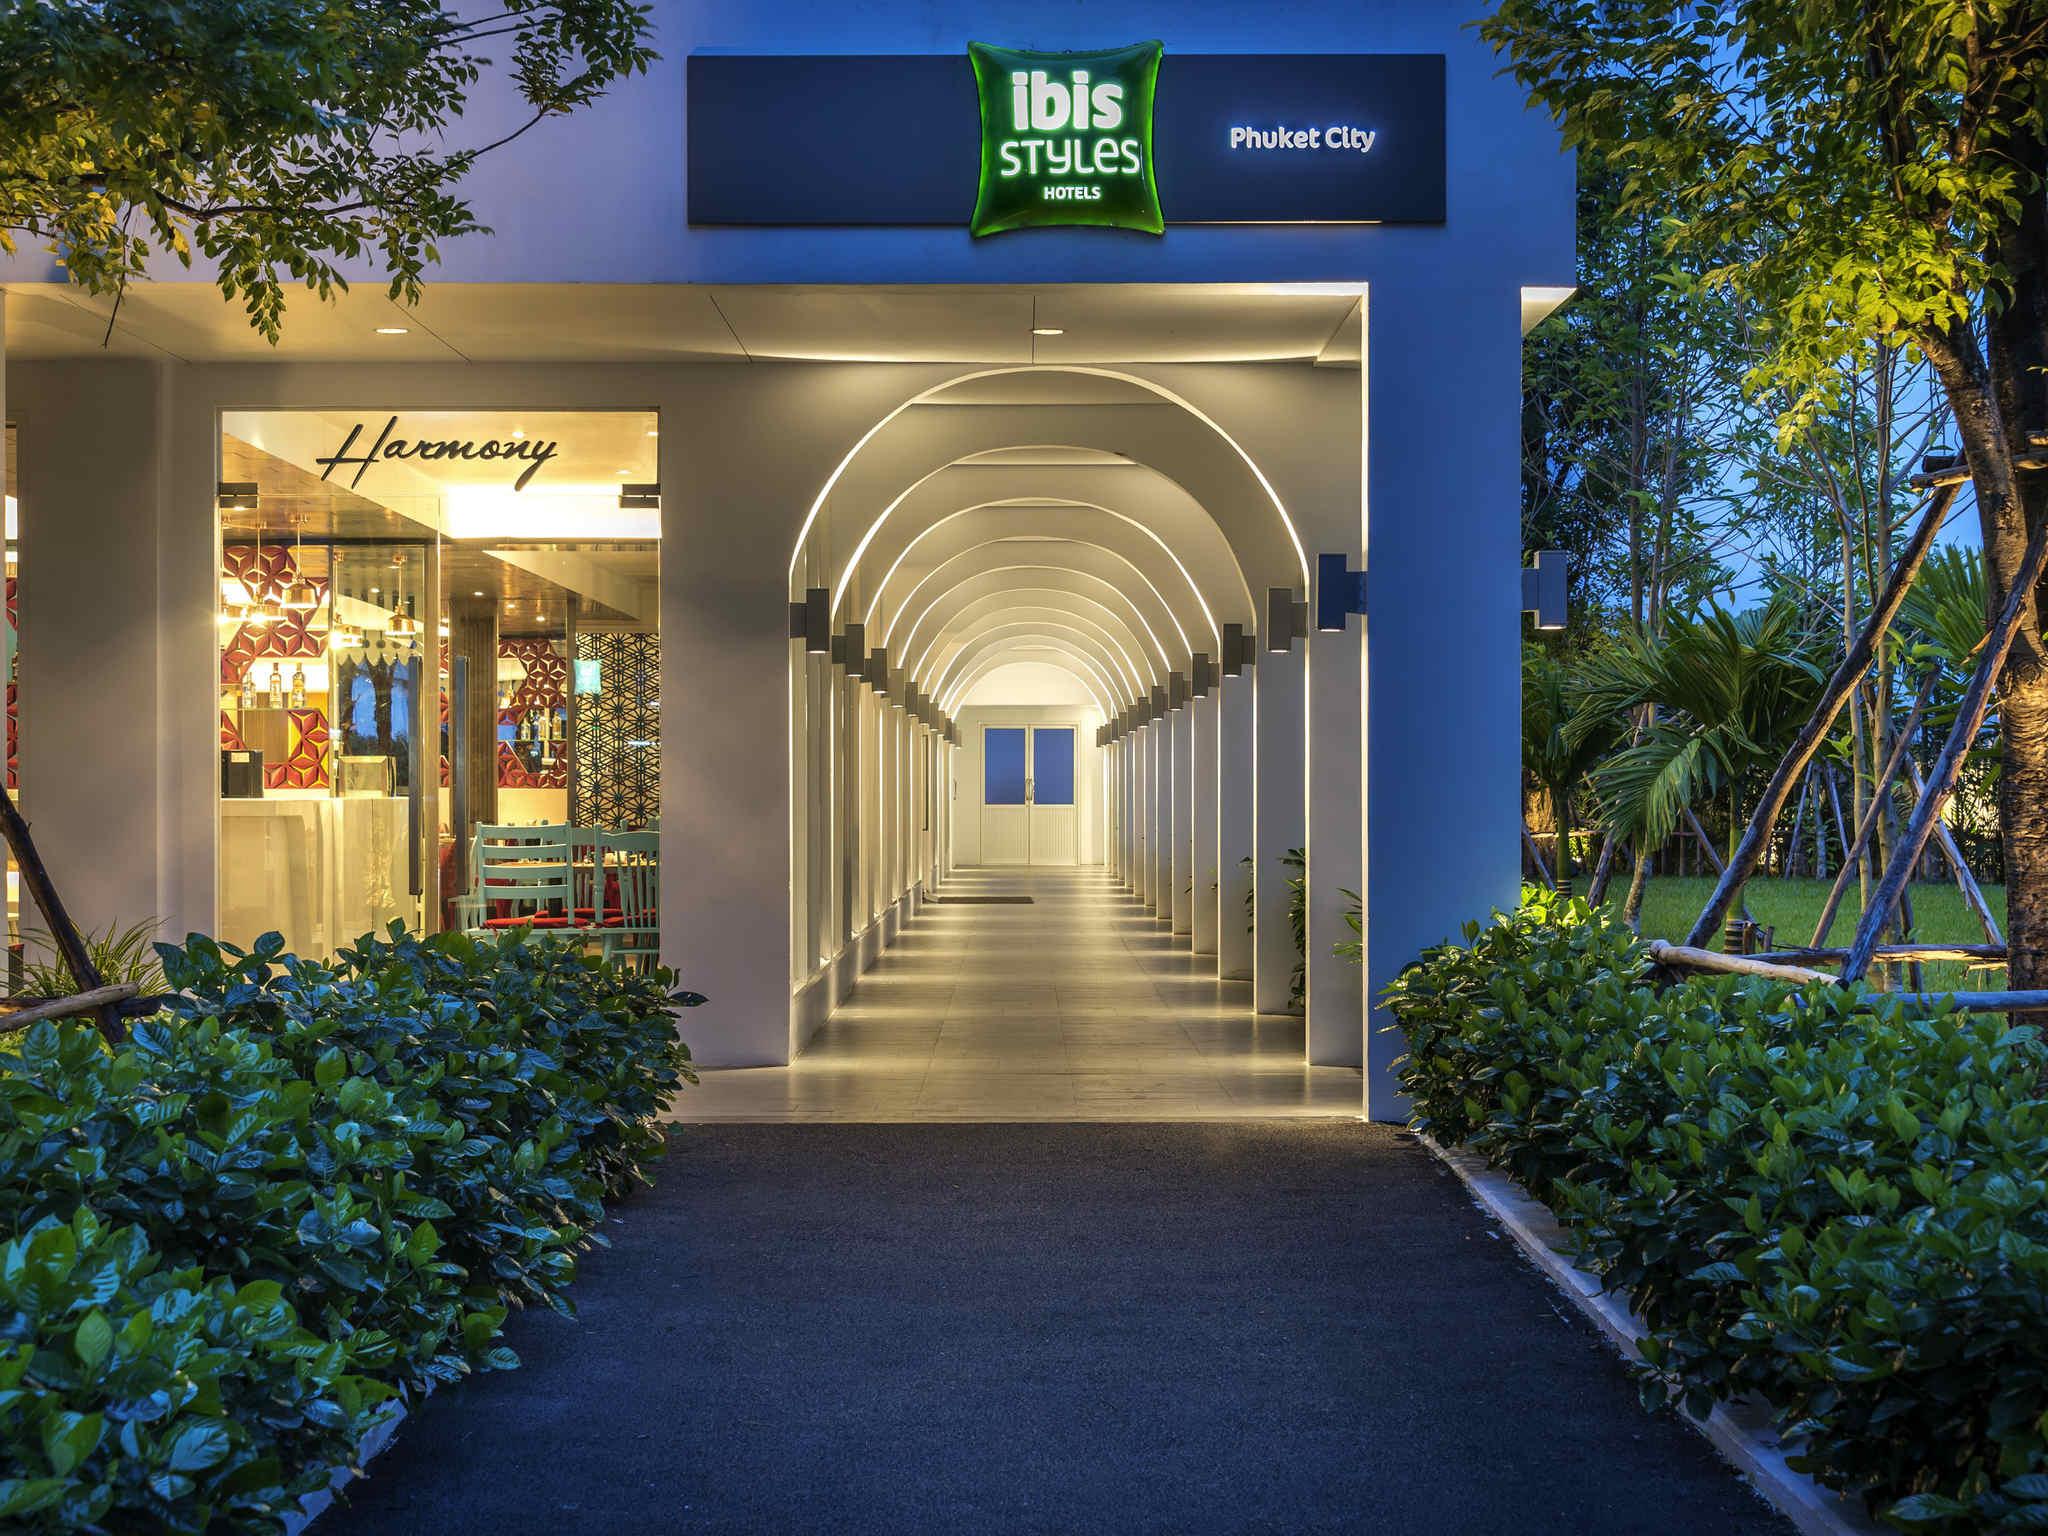 ibis styles phuket city hotel accorhotels. Black Bedroom Furniture Sets. Home Design Ideas